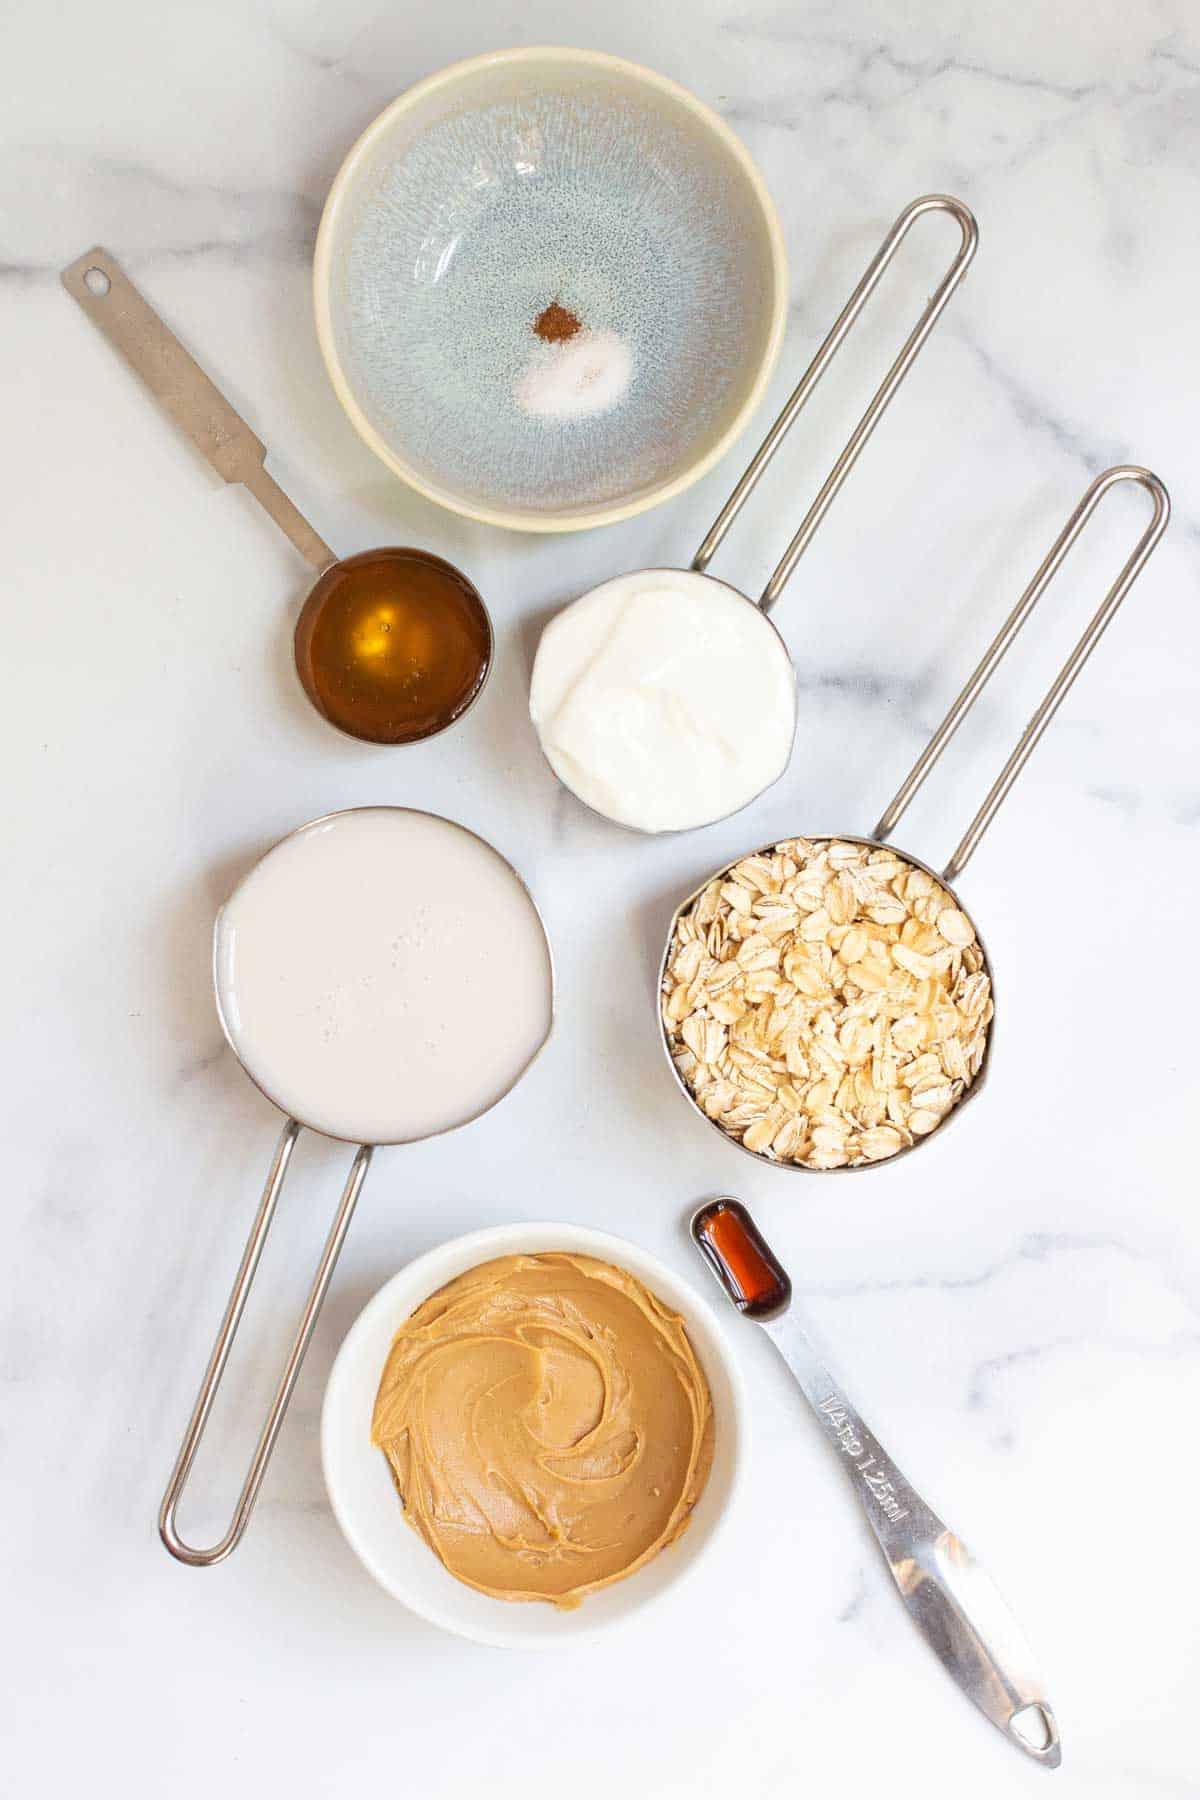 Peanut Butter Overnight Oats ingredients: oatmeals, milk, Greek yogurt, creamy peanut butter, honey, vanilla extract, salt, and cinnamon.